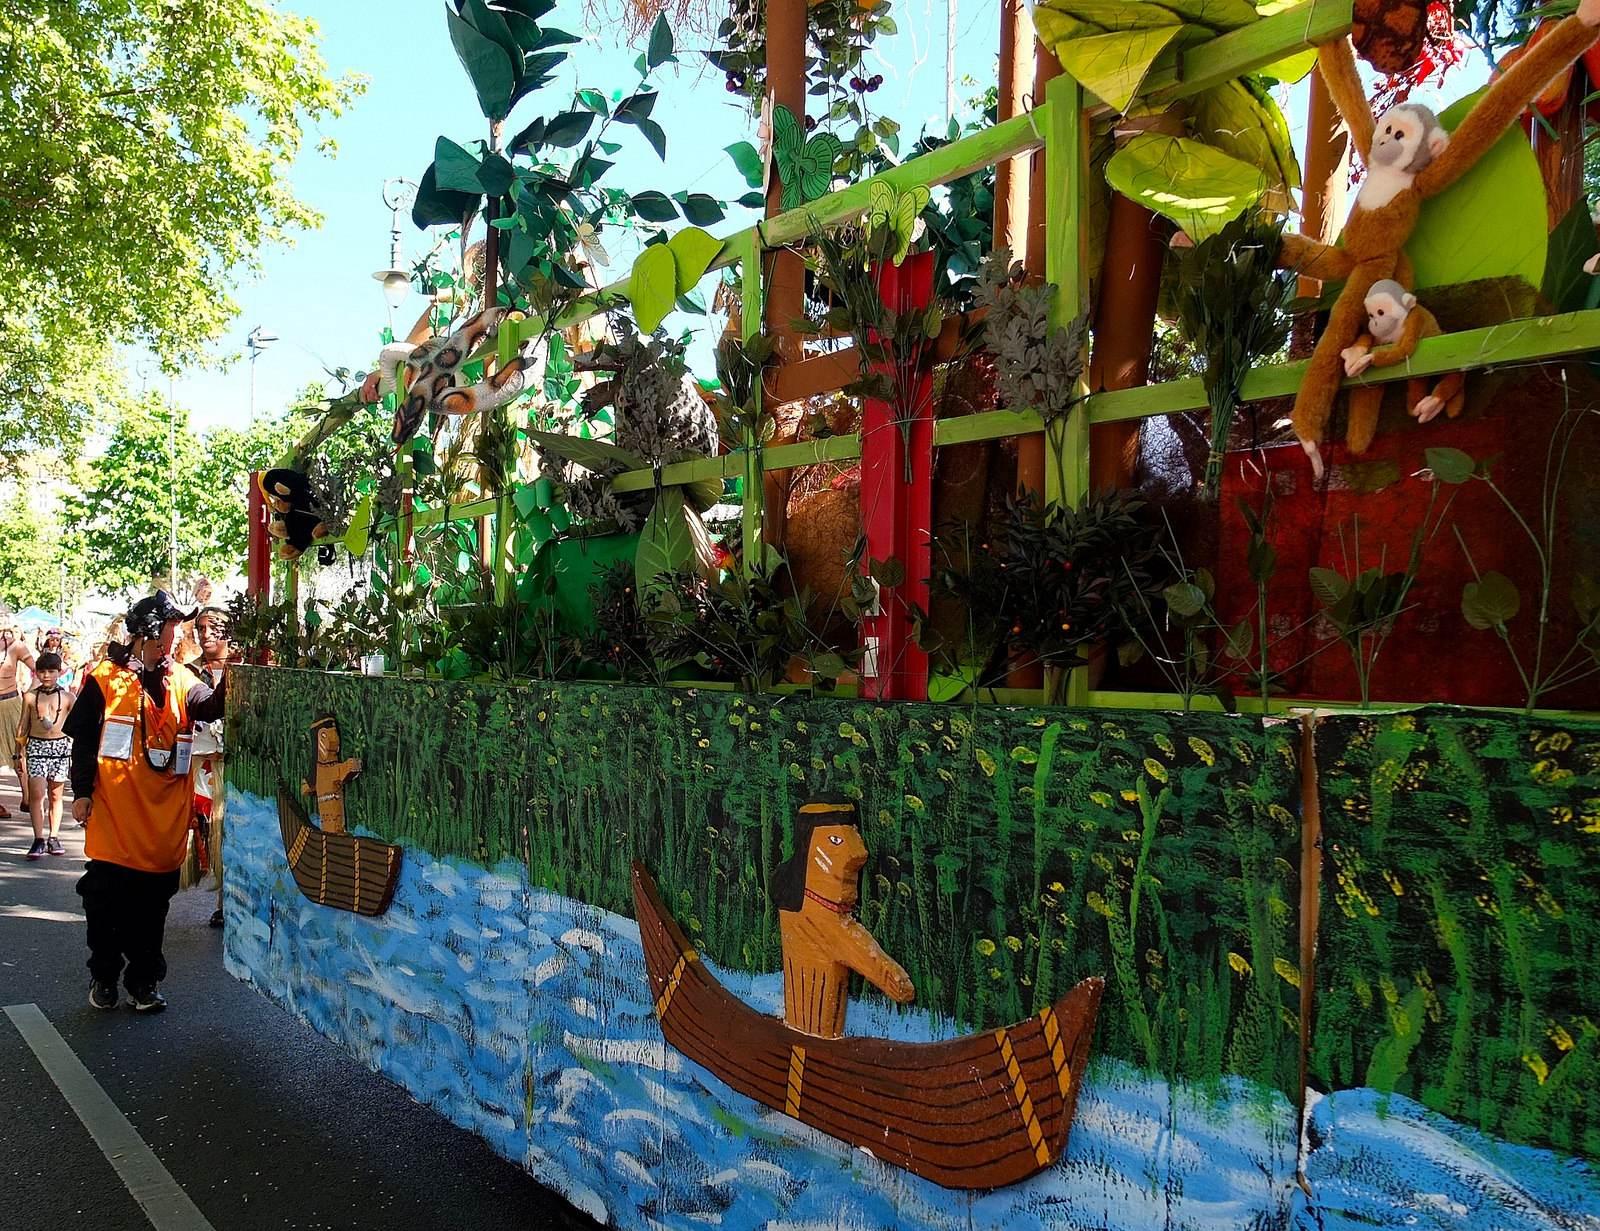 karnevalderkulturen12 KdK   Karneval der Kulturen in Berlin (Carnival of Cultures)